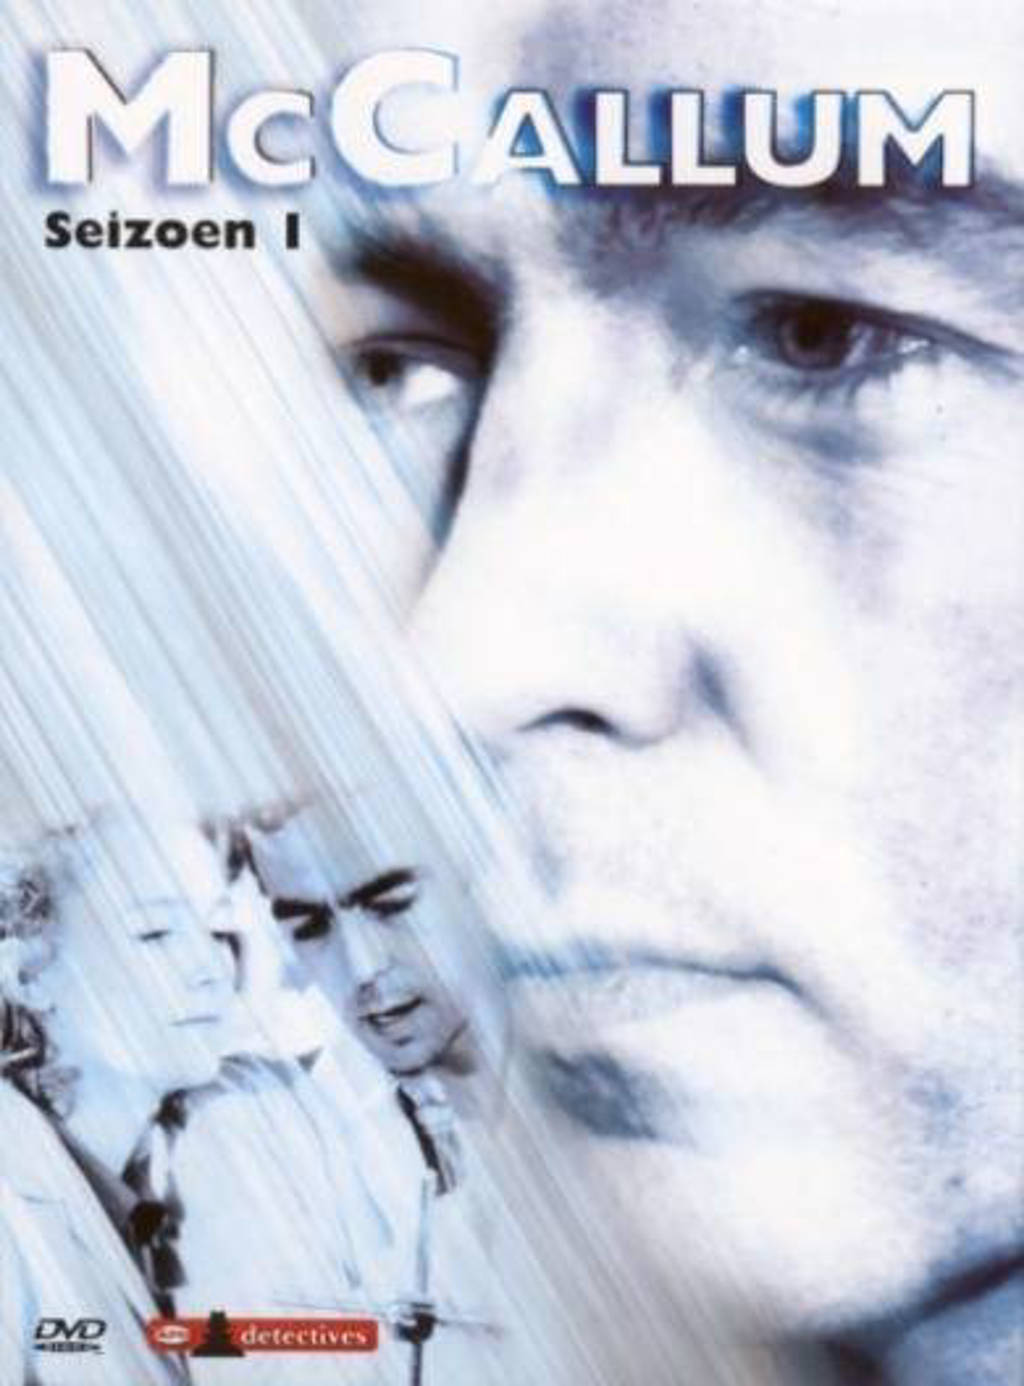 McCallum - Seizoen 1 (DVD)